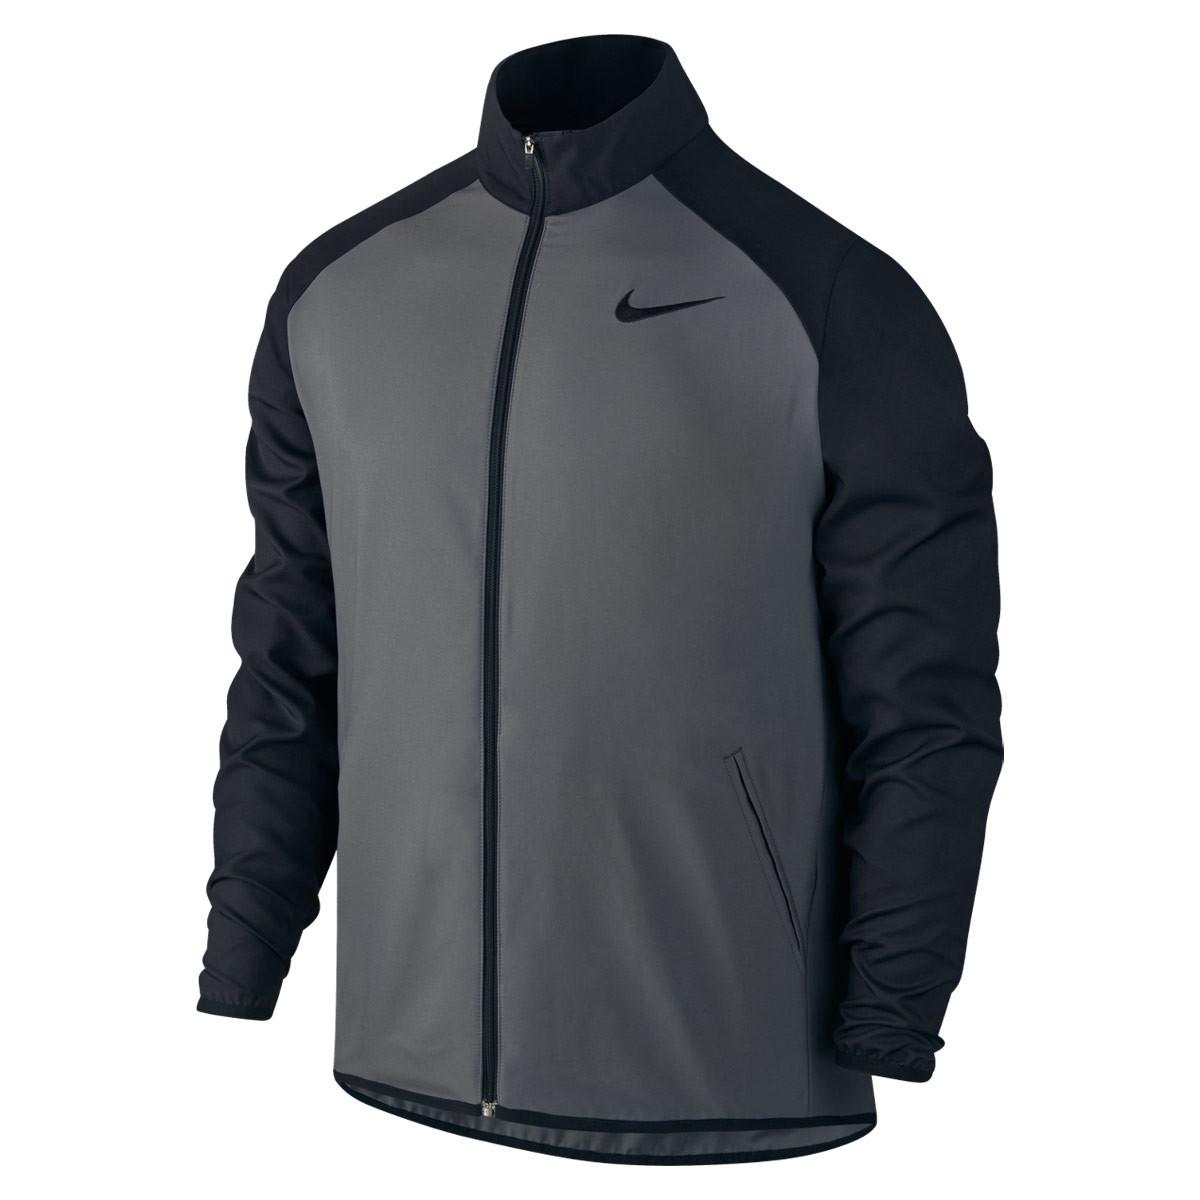 Nike Dry Team Training Jacket Running jackets for Men Grey